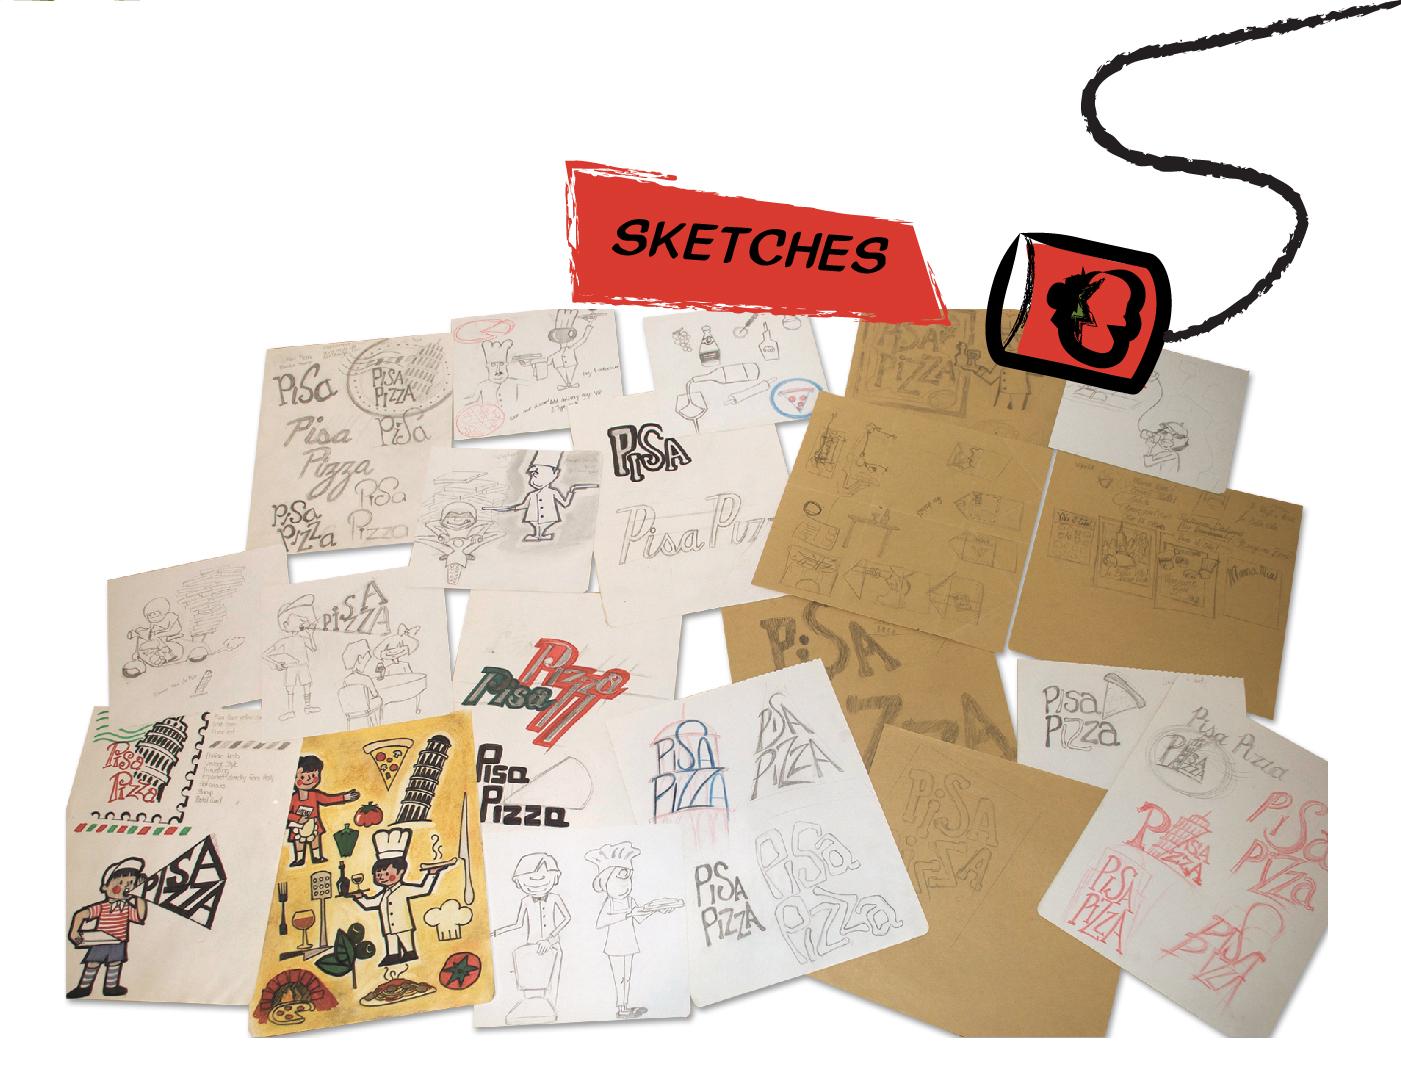 14-pisa-pizza_restaurant-sketches.jpg